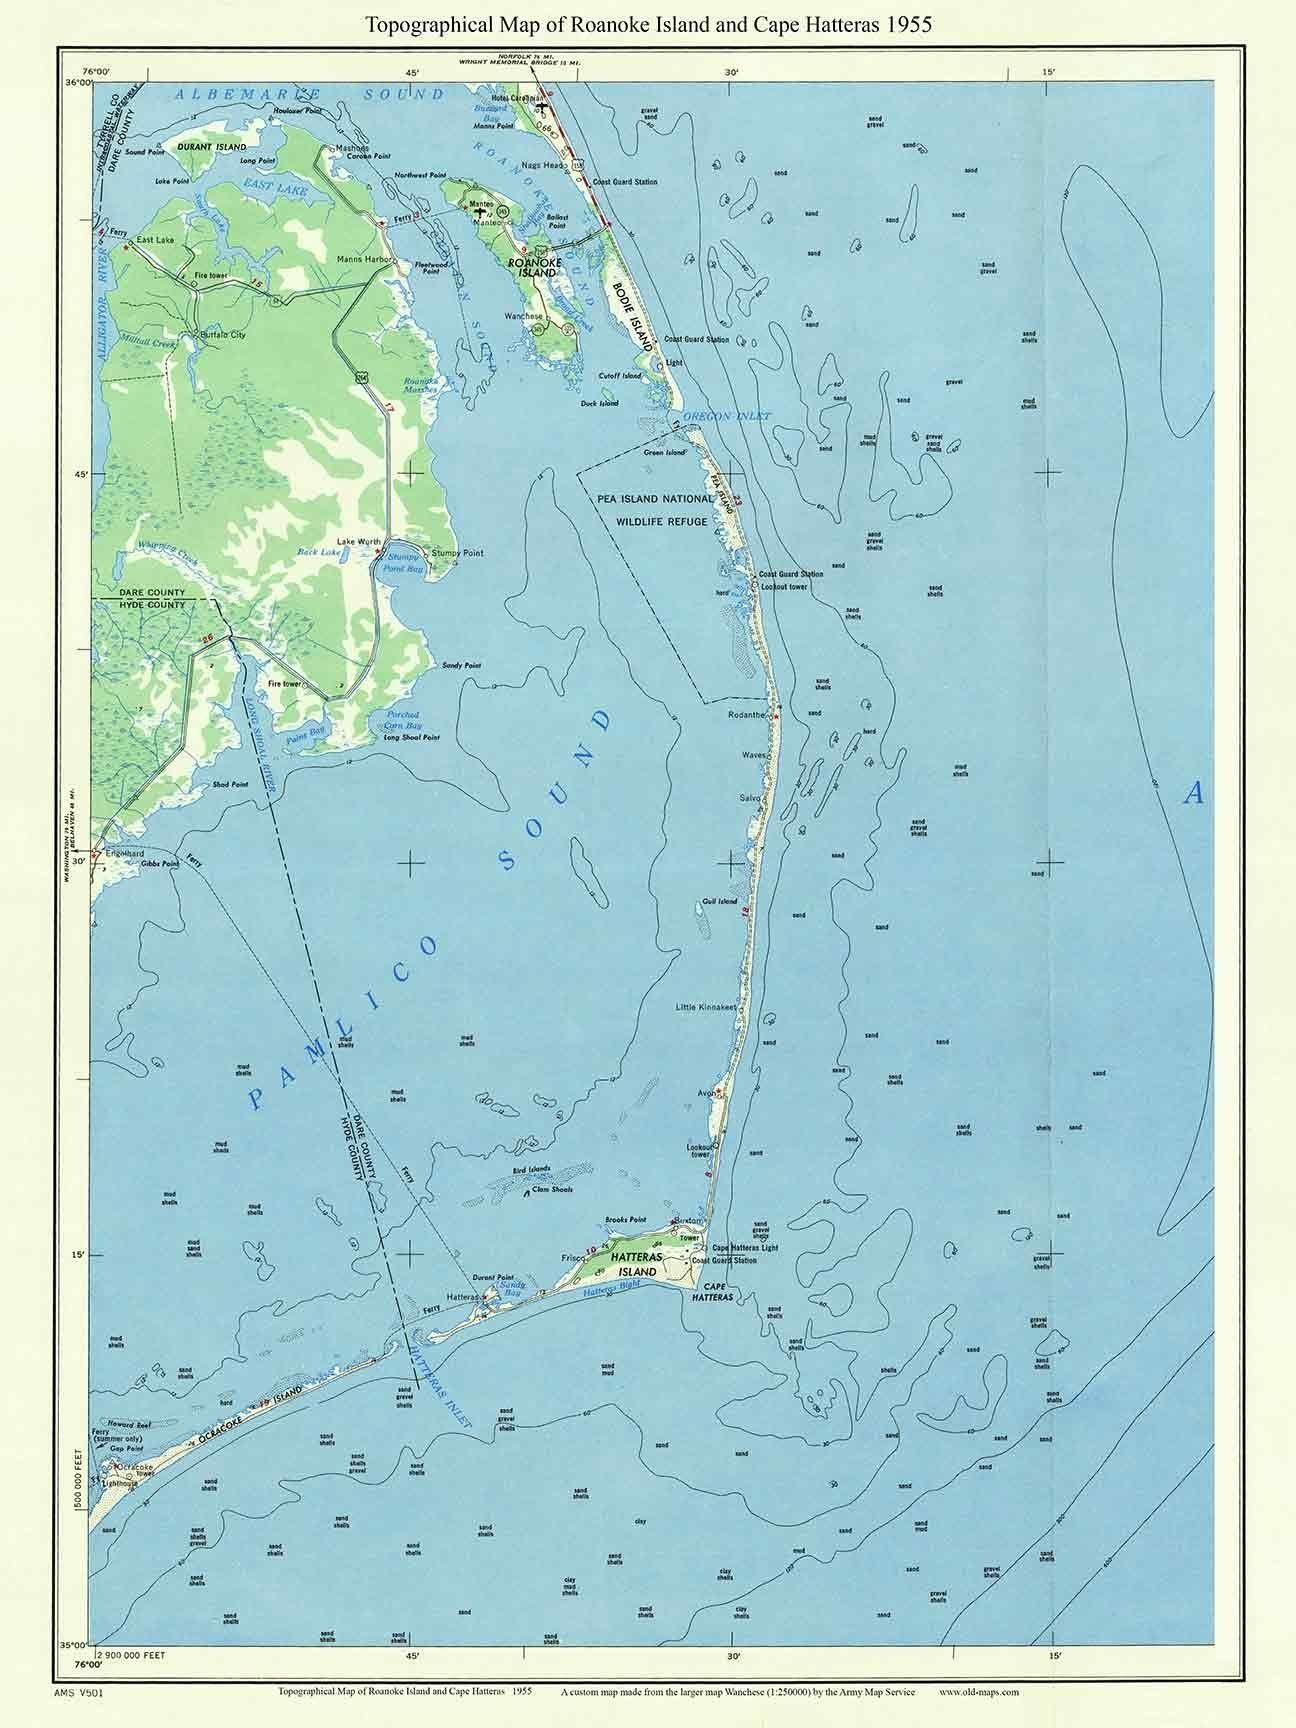 Roanoke Island Cape Hatteras 1955 Map Topographic Usgs Custom Reprint North Carolina 1x2